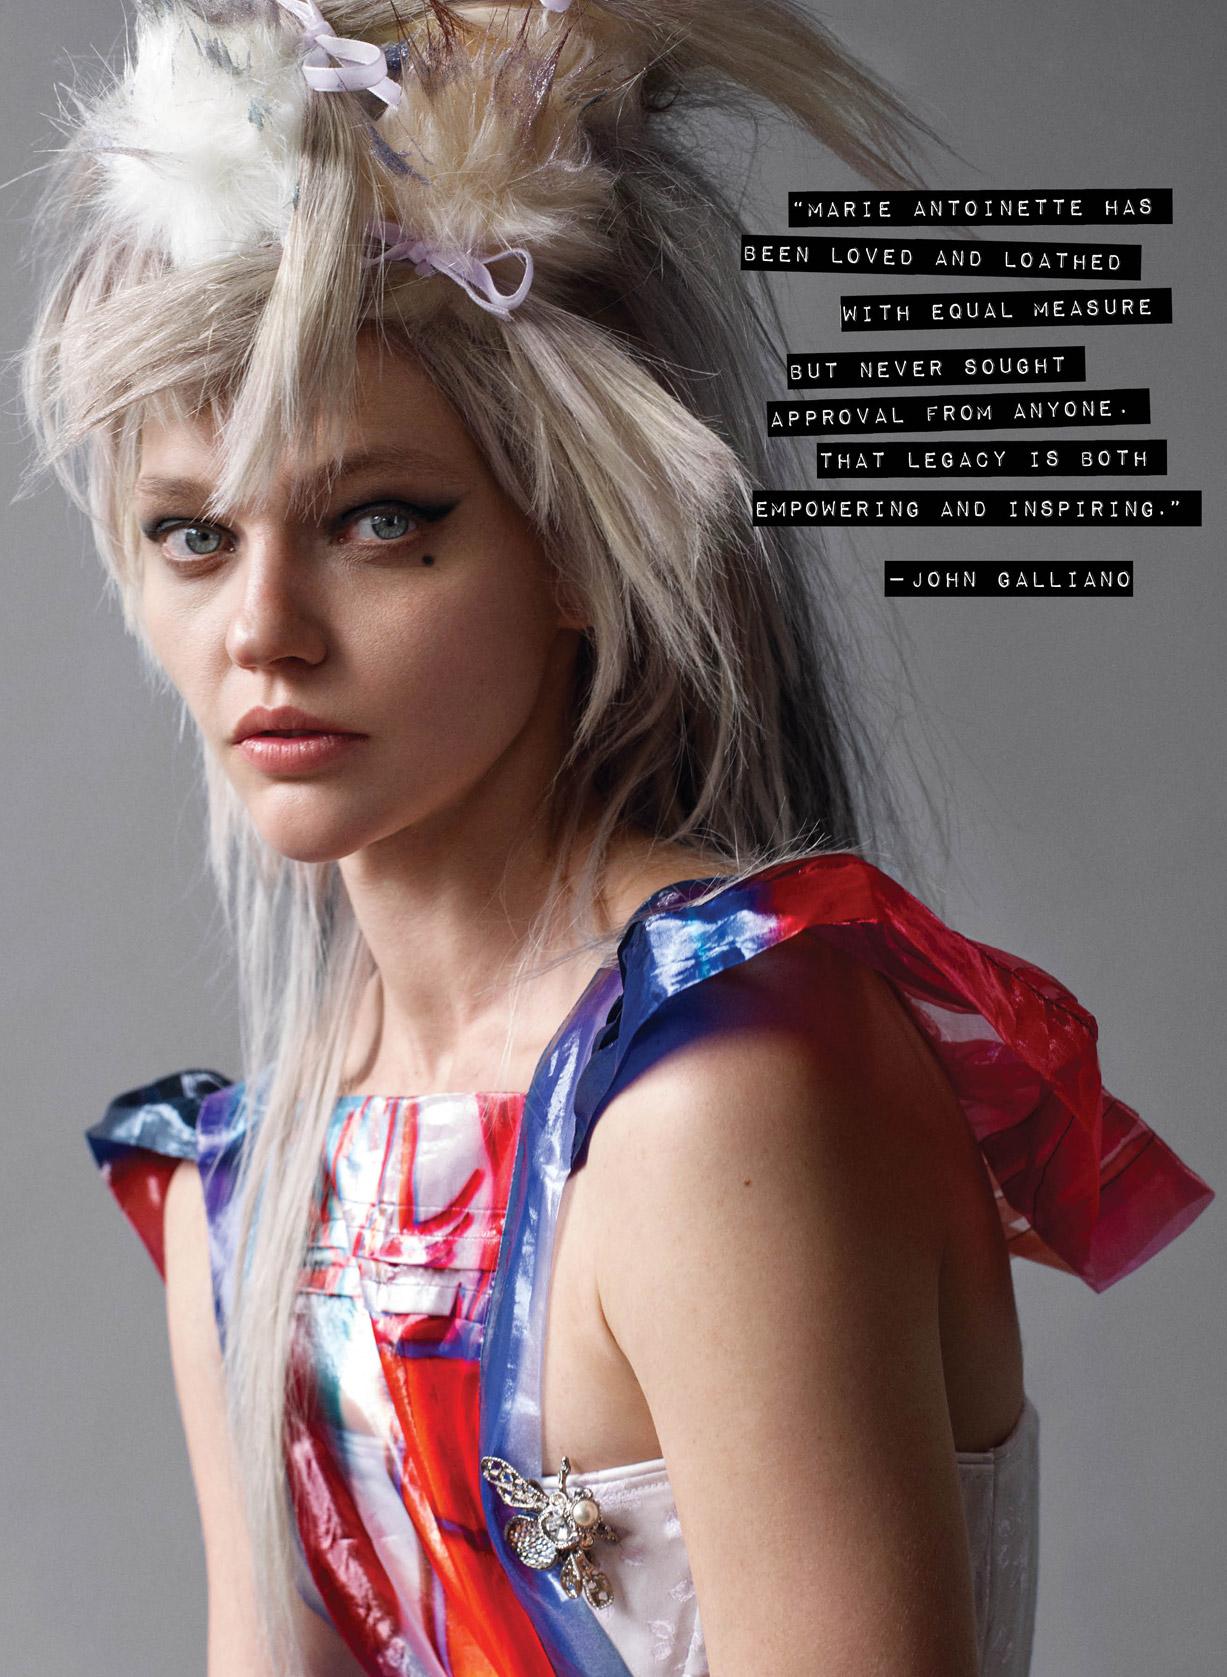 Саша Пивоварова / Sasha Pivovarova by Rory van Milligen - CR Fashion Book #9